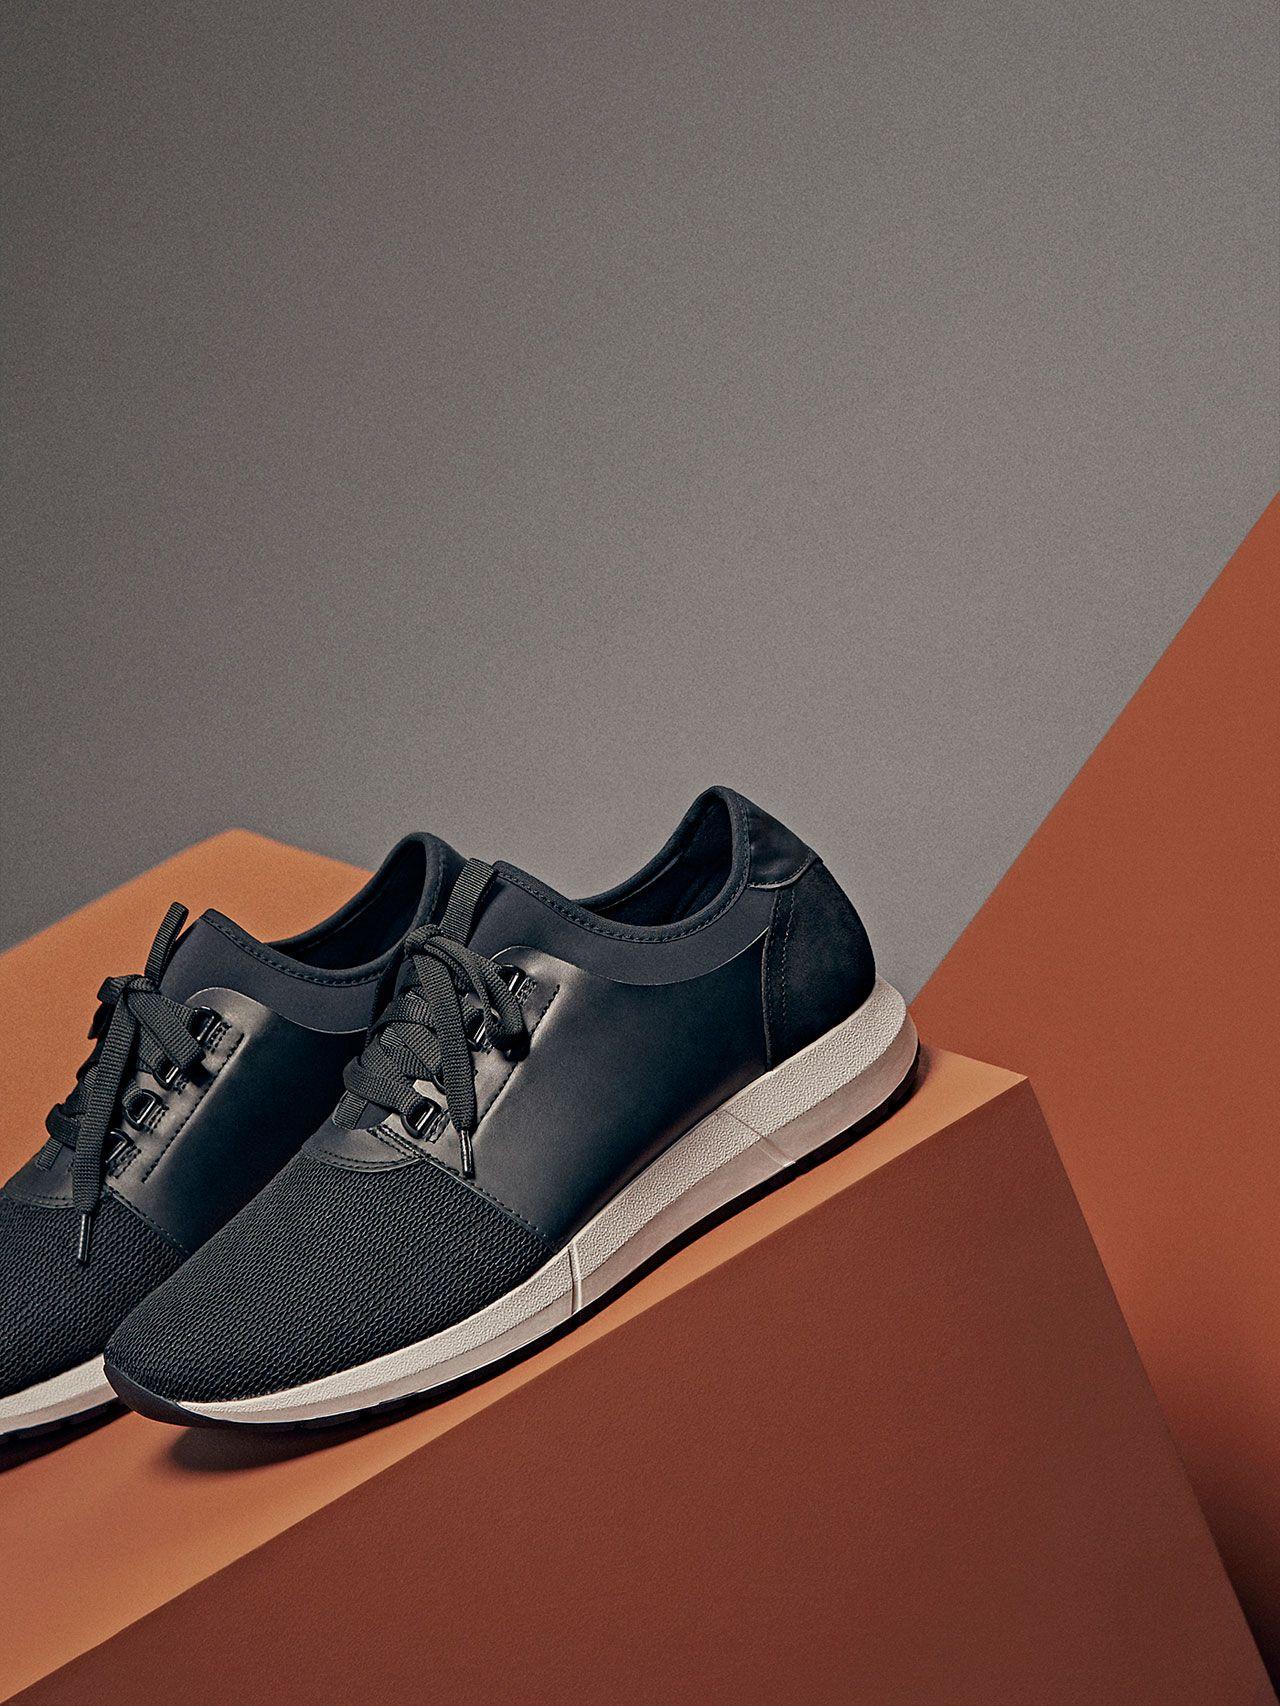 View all - Shoes - MEN - Massimo Dutti - United Kingdom  ad7a2bcac2c